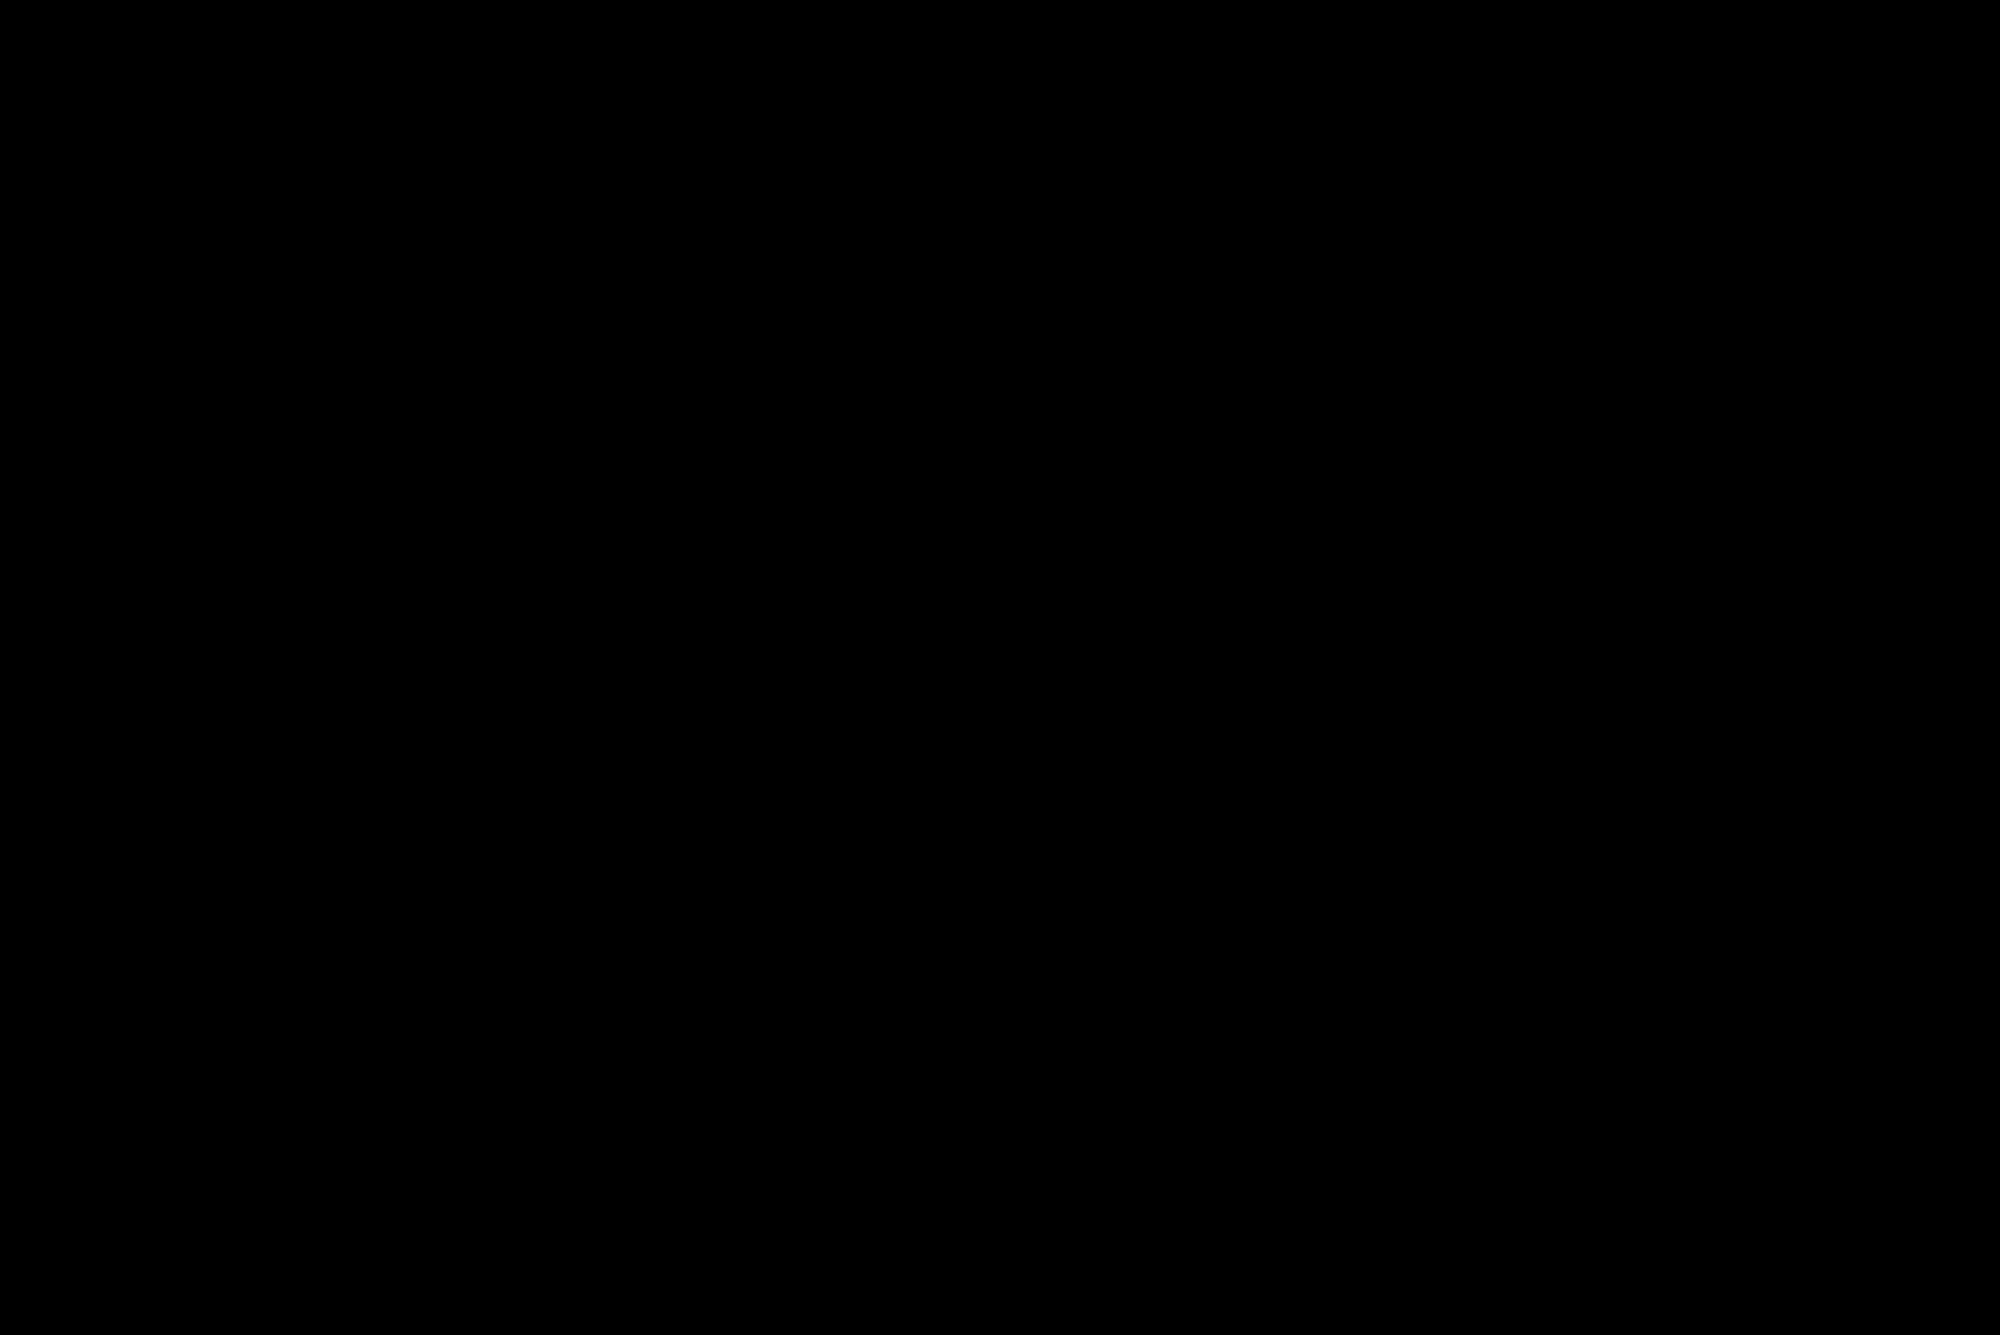 SA1 2158